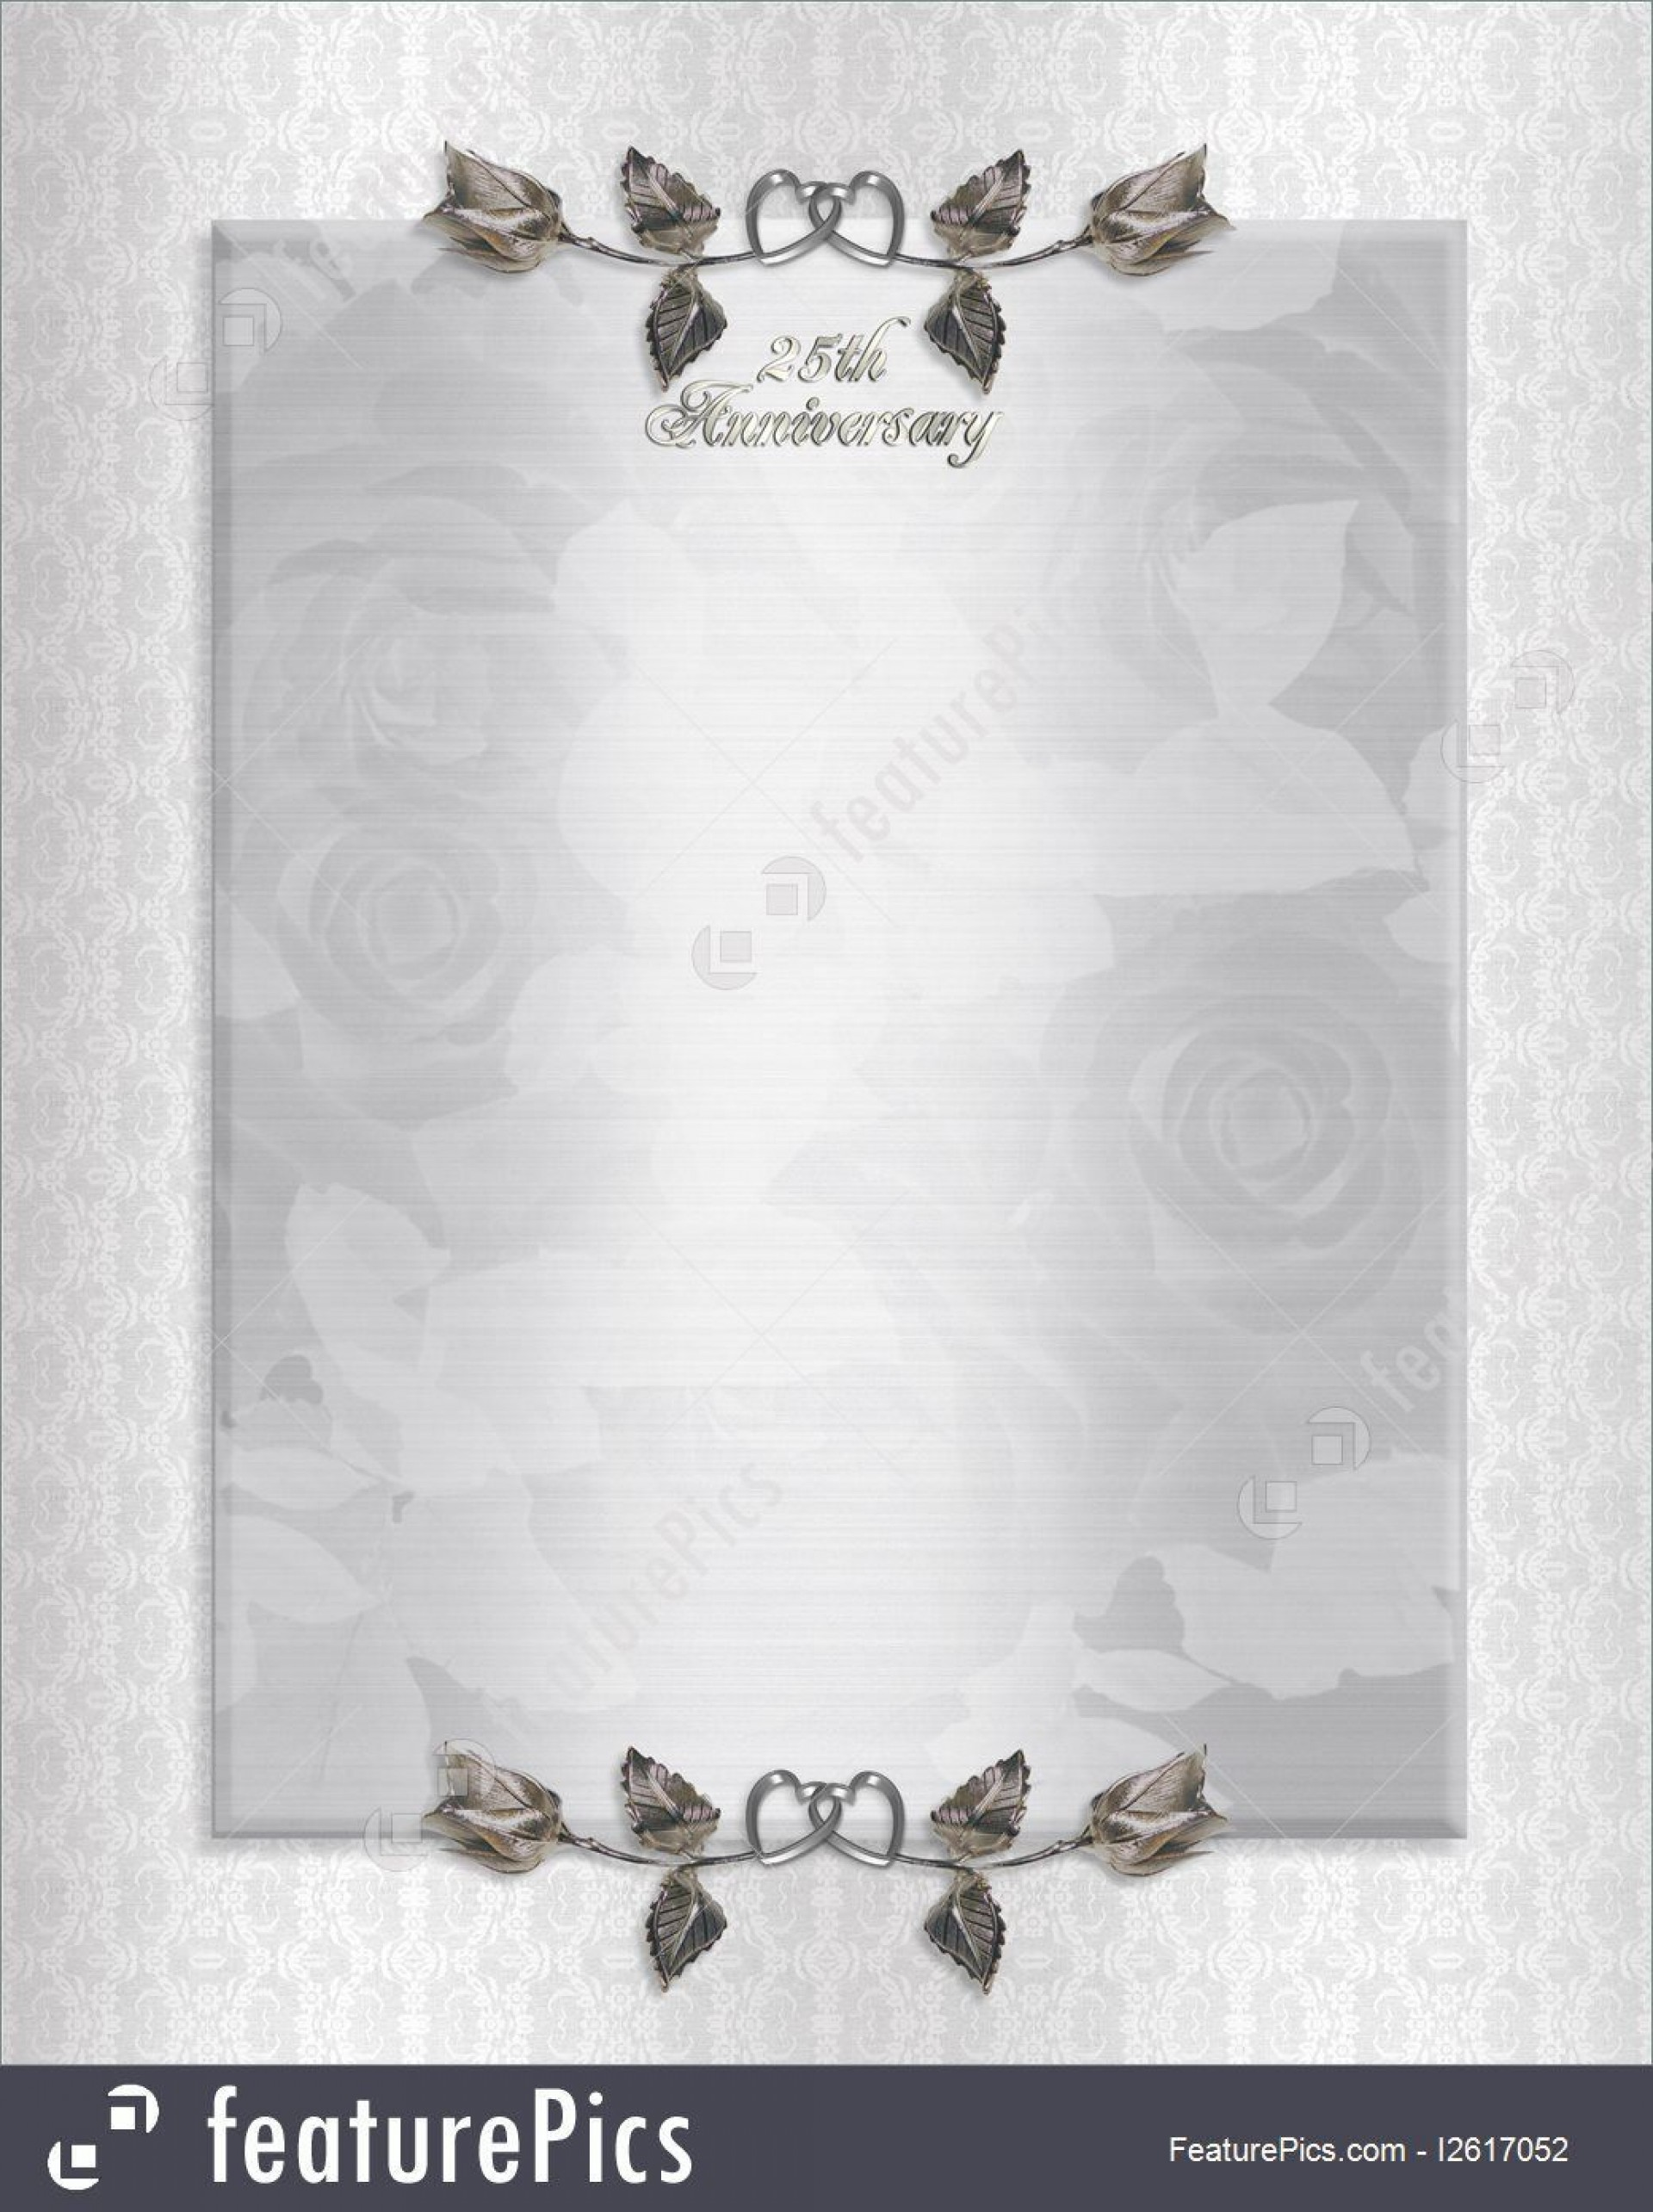 001 Frightening 50th Anniversary Invitation Card Template Inspiration  Templates Free1920